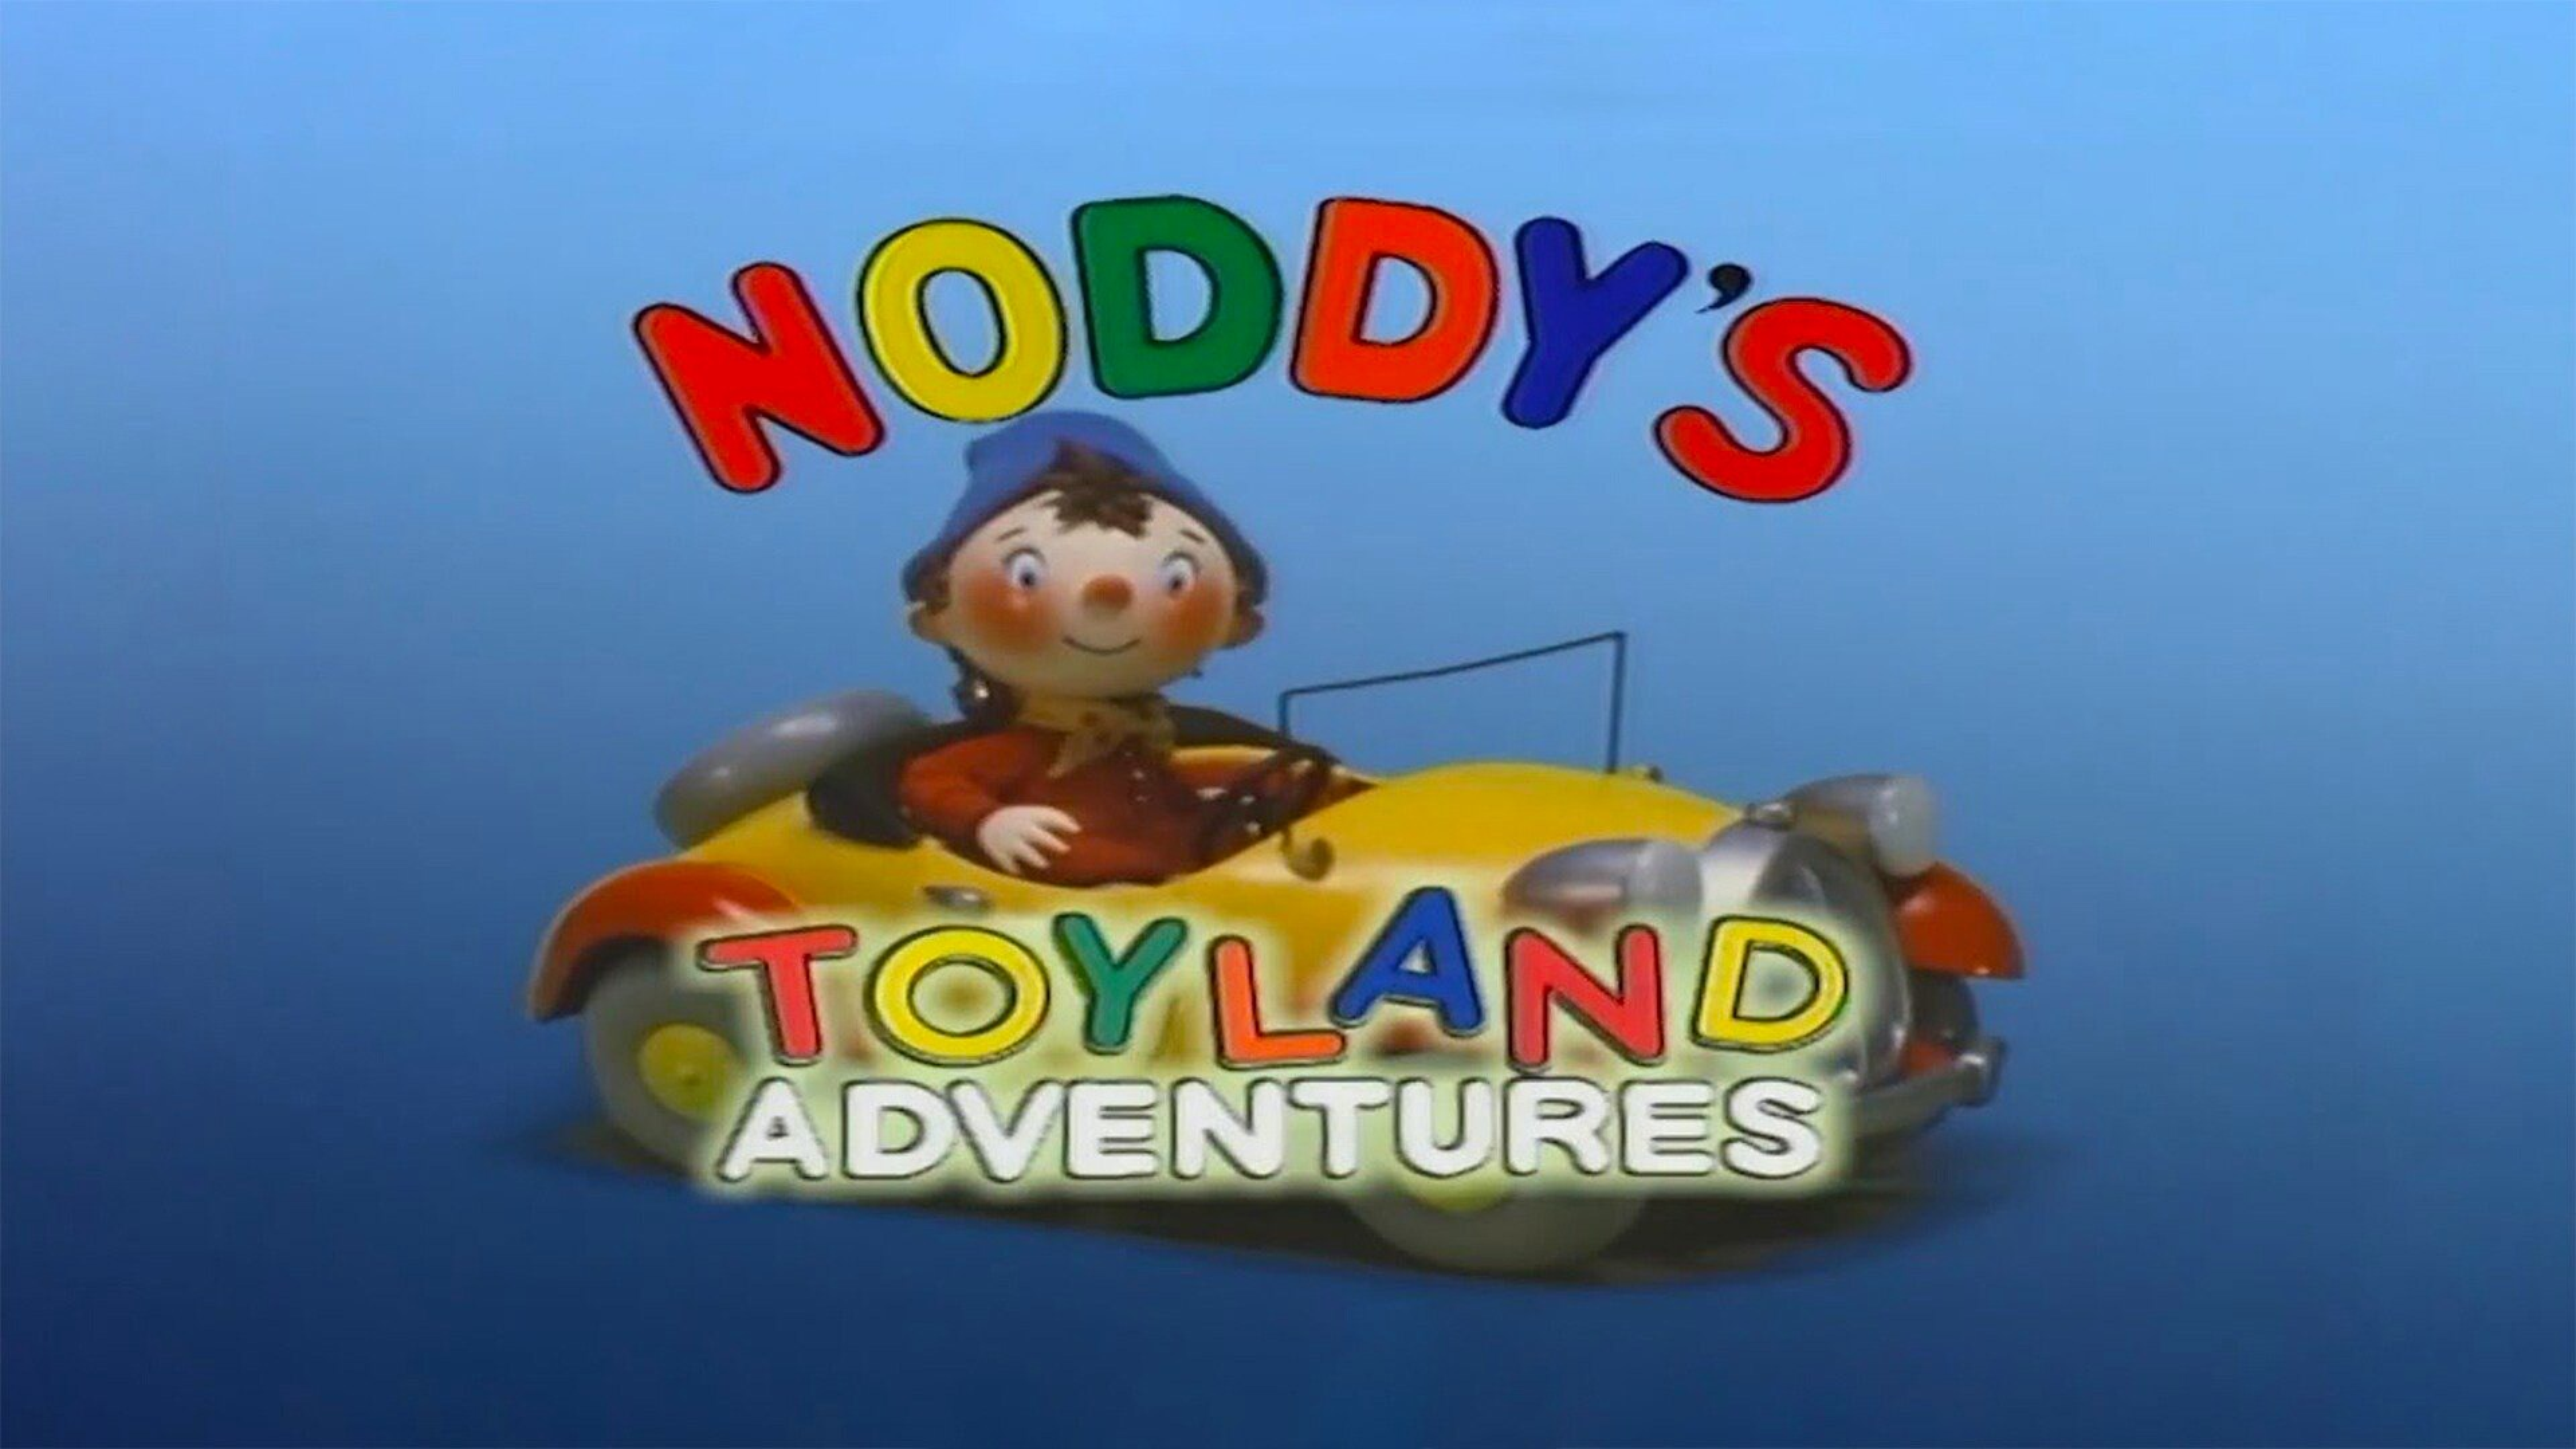 Noddy Makes a New Friend